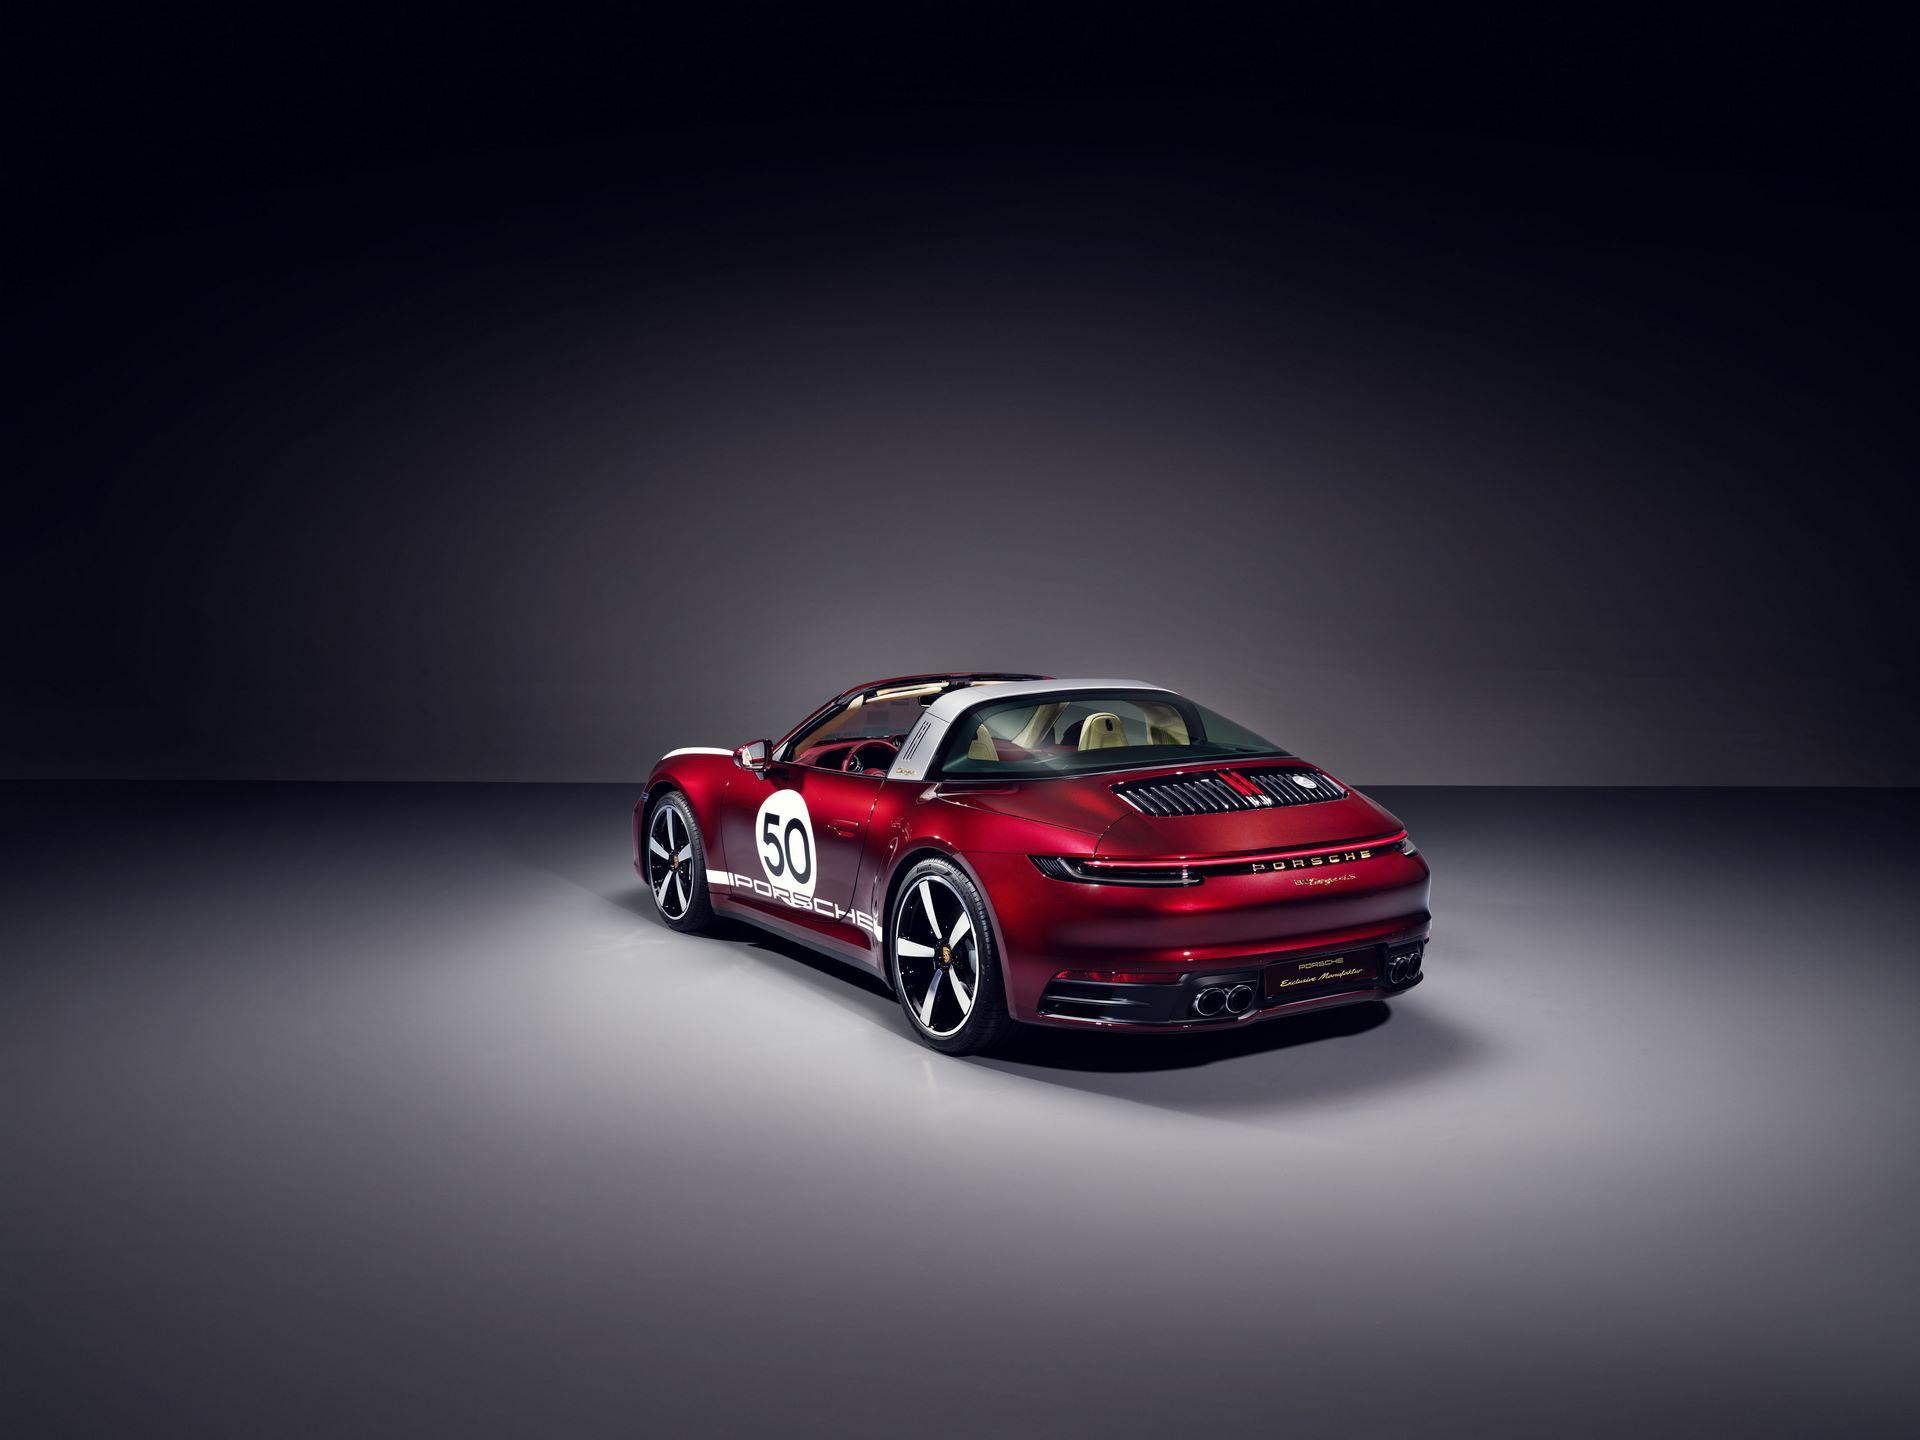 Porsche-911-Targa-4S-Heritage-Design-Edition-38